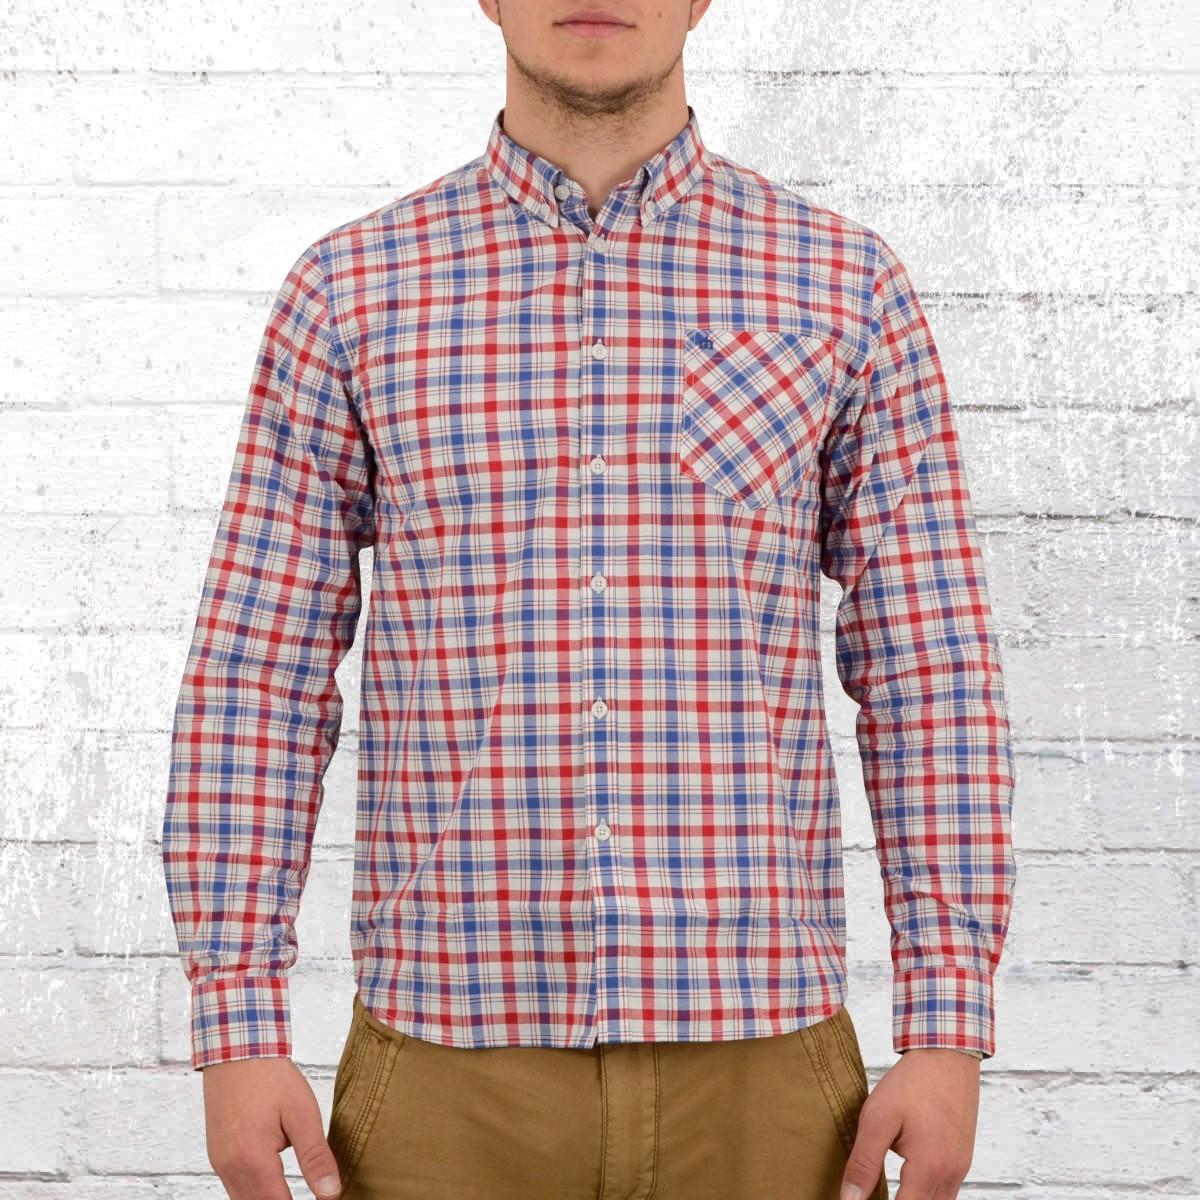 d5eb5988a70 Merc Check Shirt Longsleeve Button-Down Walpole red blue white. ›‹ «